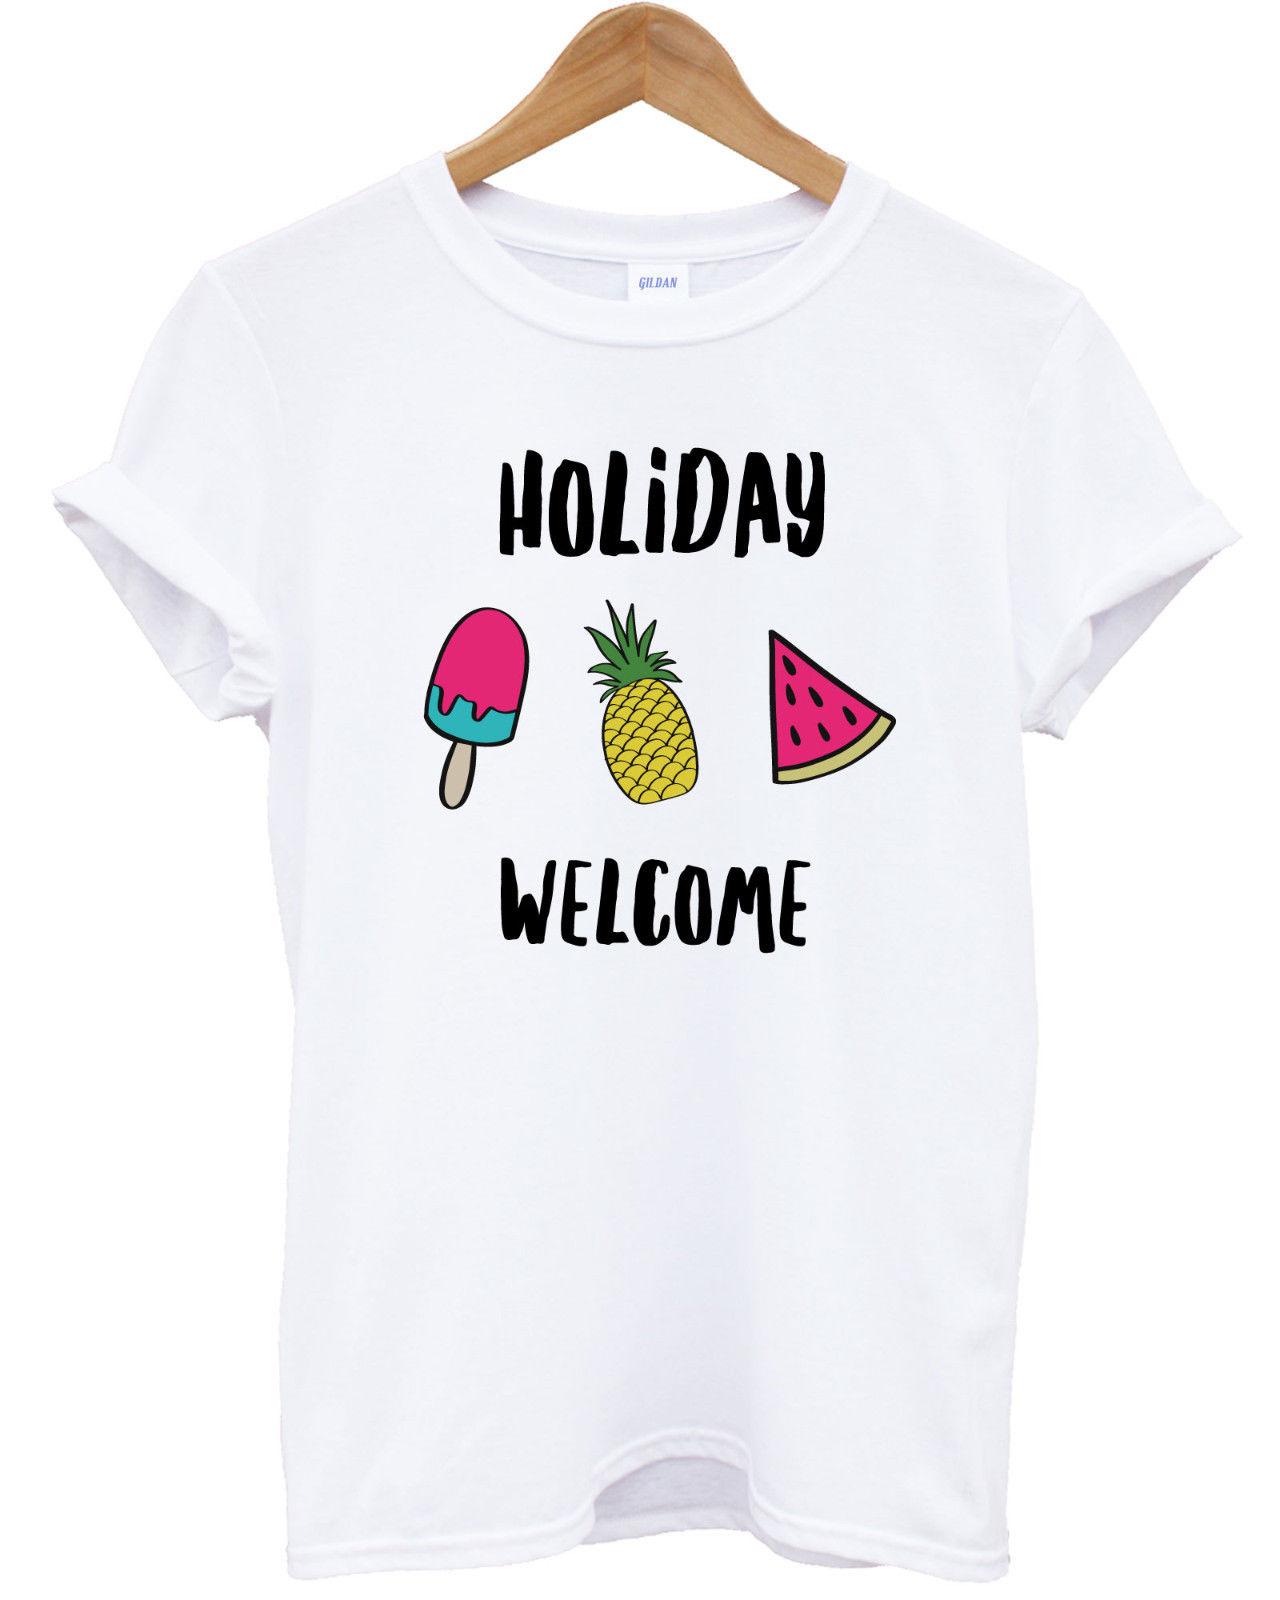 Design t shirt for holiday - Summer Holiday T Shirt Top Fruit Watermelon Fruits Ice Vegan Vacation Funny Summer Women Short